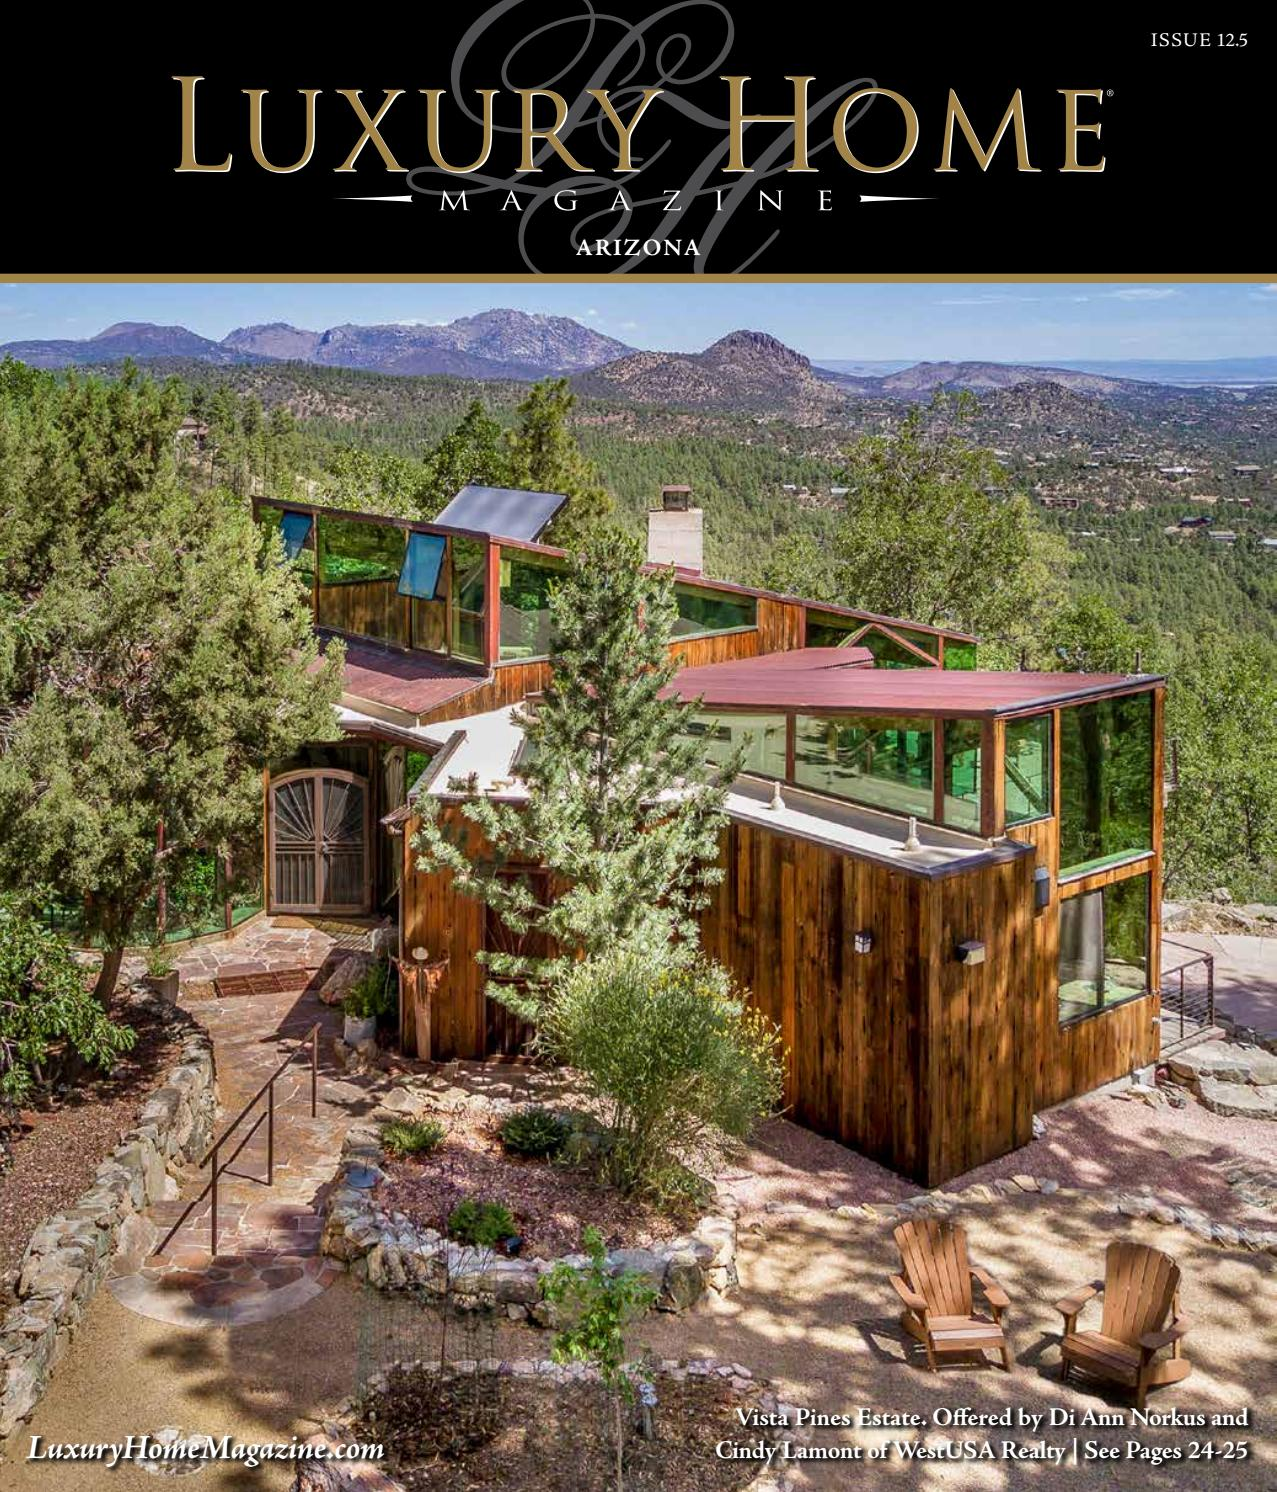 Luxury Home Magazine Arizona Issue 12.5 by Luxury Home Magazine - issuu